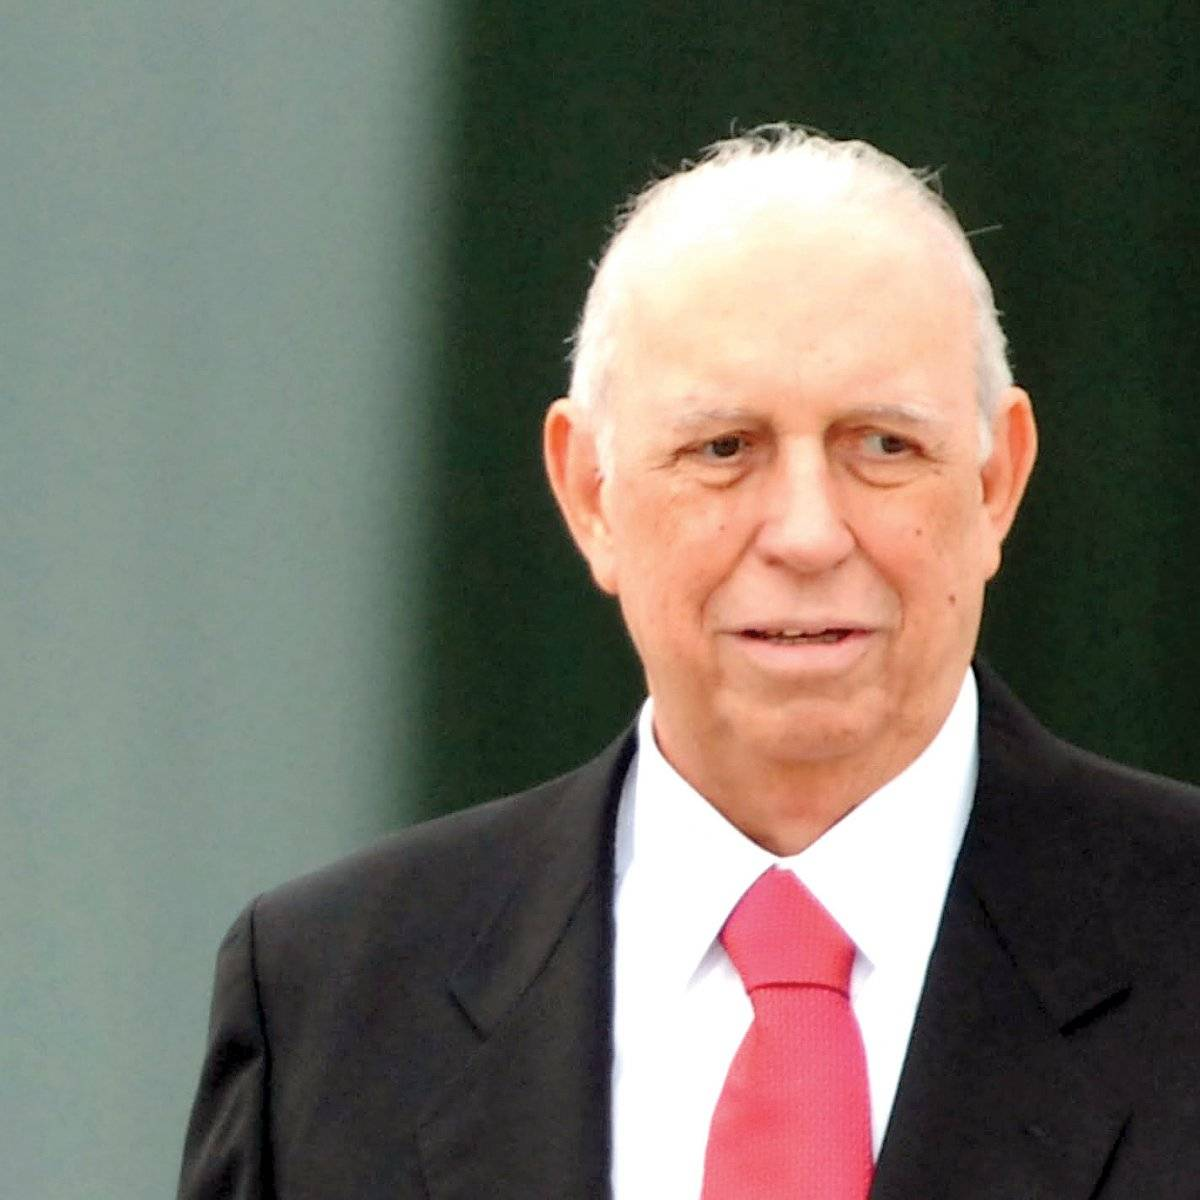 José Alencar Arquivo/Agência Brasil